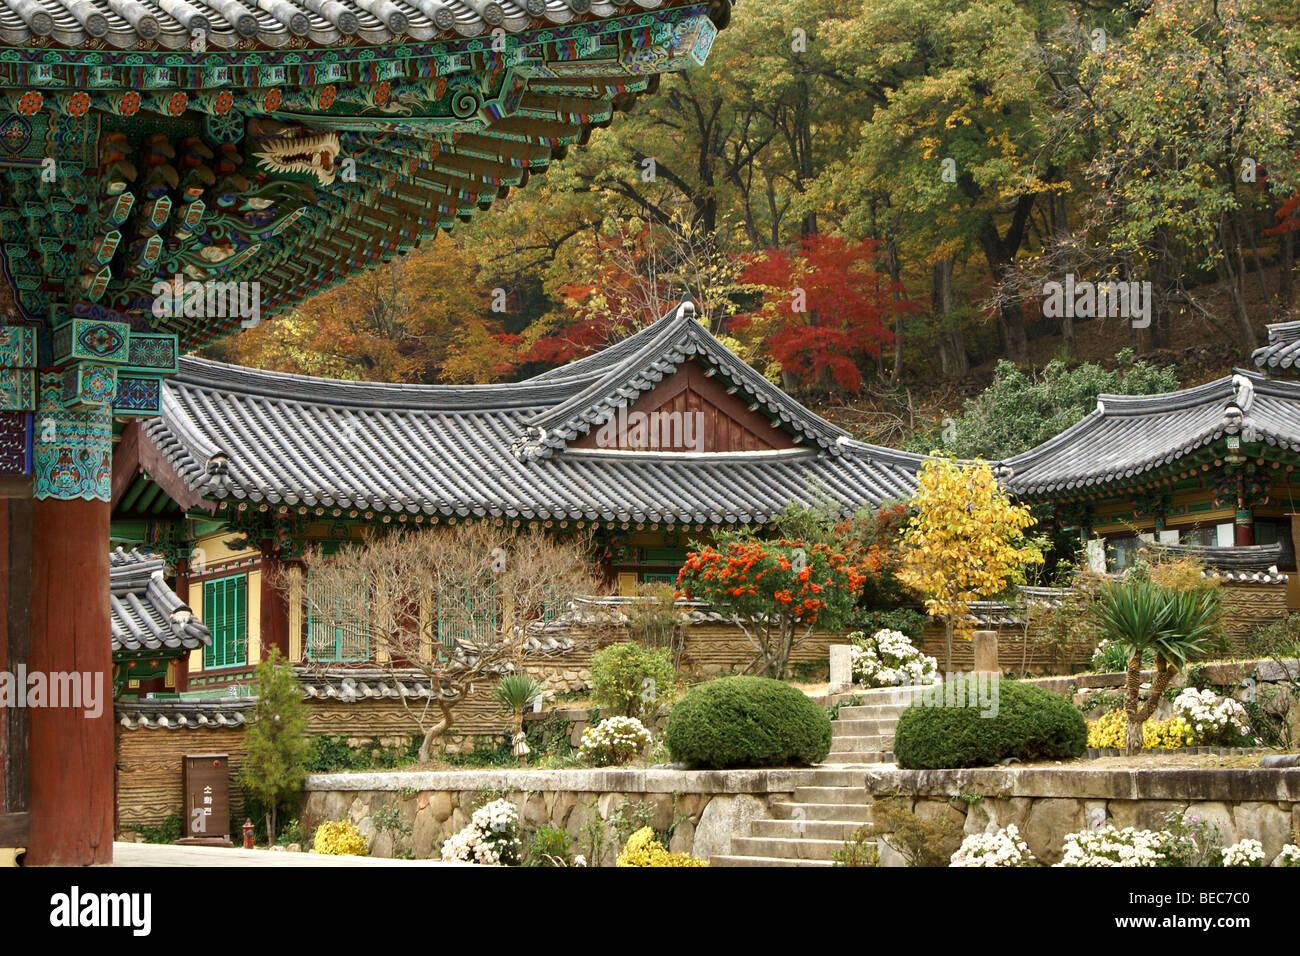 Seonamsa Buddhist temple, Suncheon, South Korea Stock Photo ...